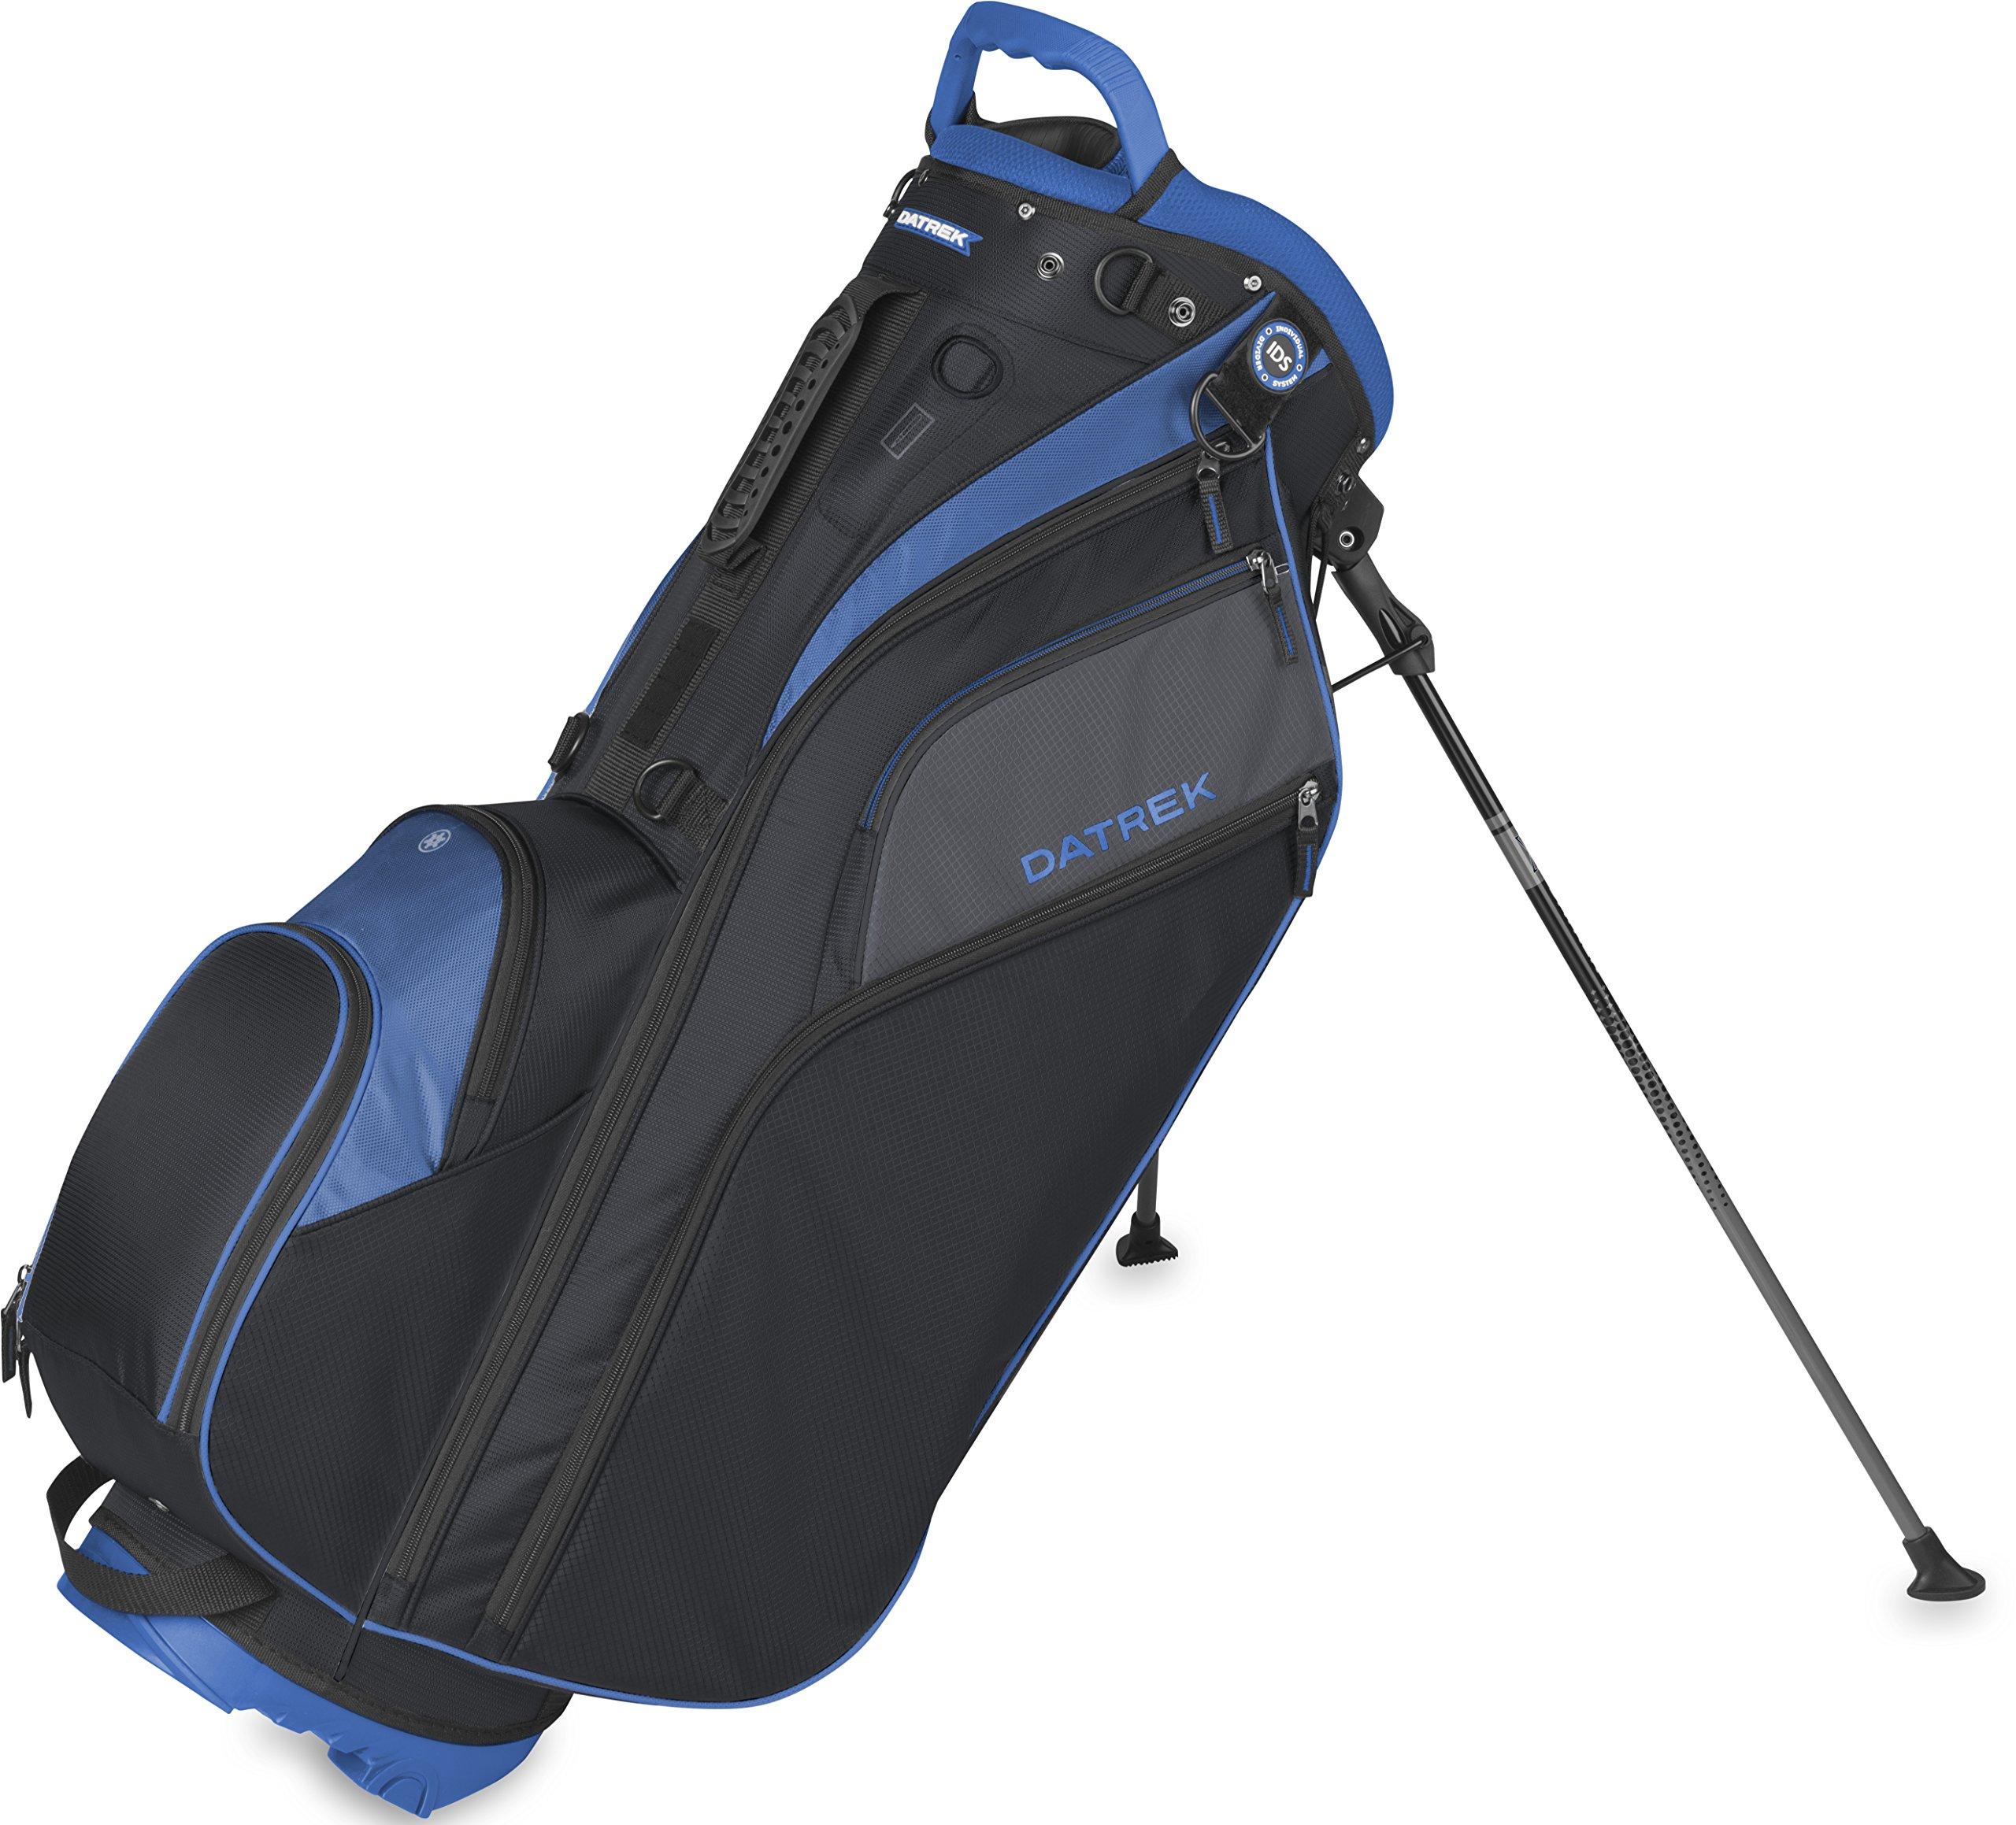 Datrek Golf Go Lite Hybrid Stand Bag (Black/Slate/Royal)